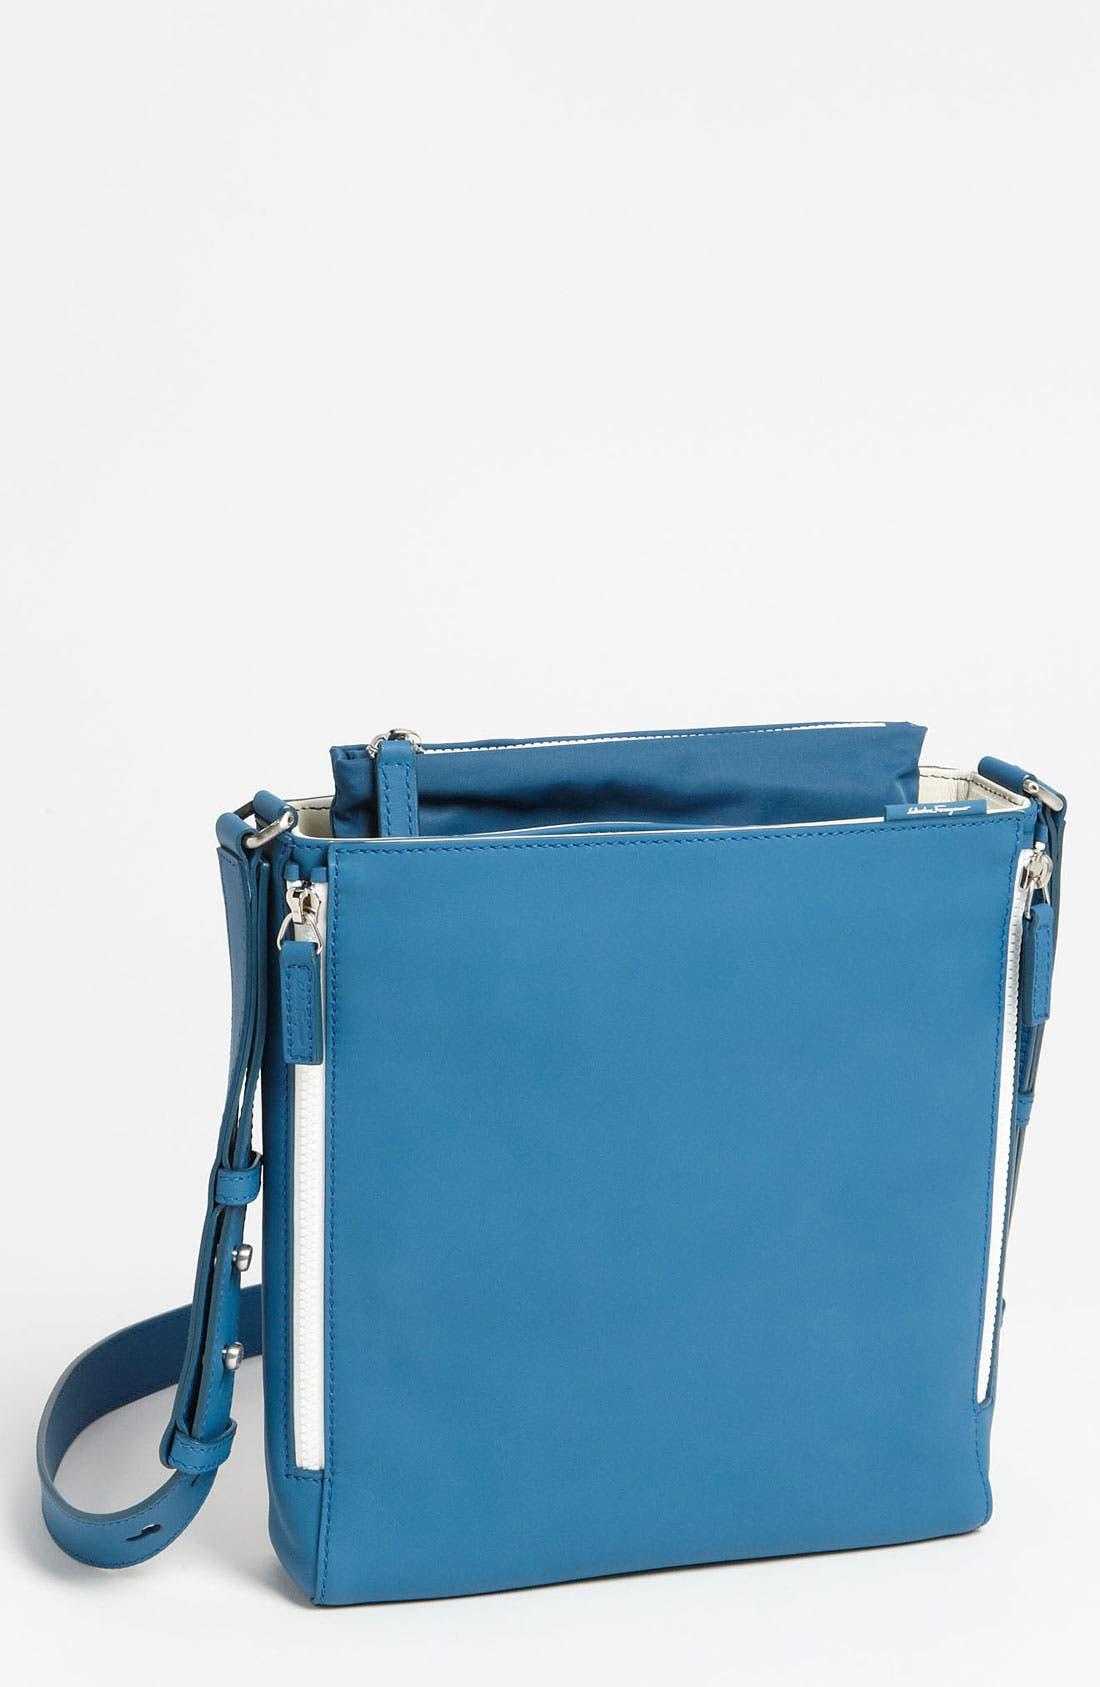 Alternate Image 1 Selected - Salvatore Ferragamo 'Pop' Shoulder Bag